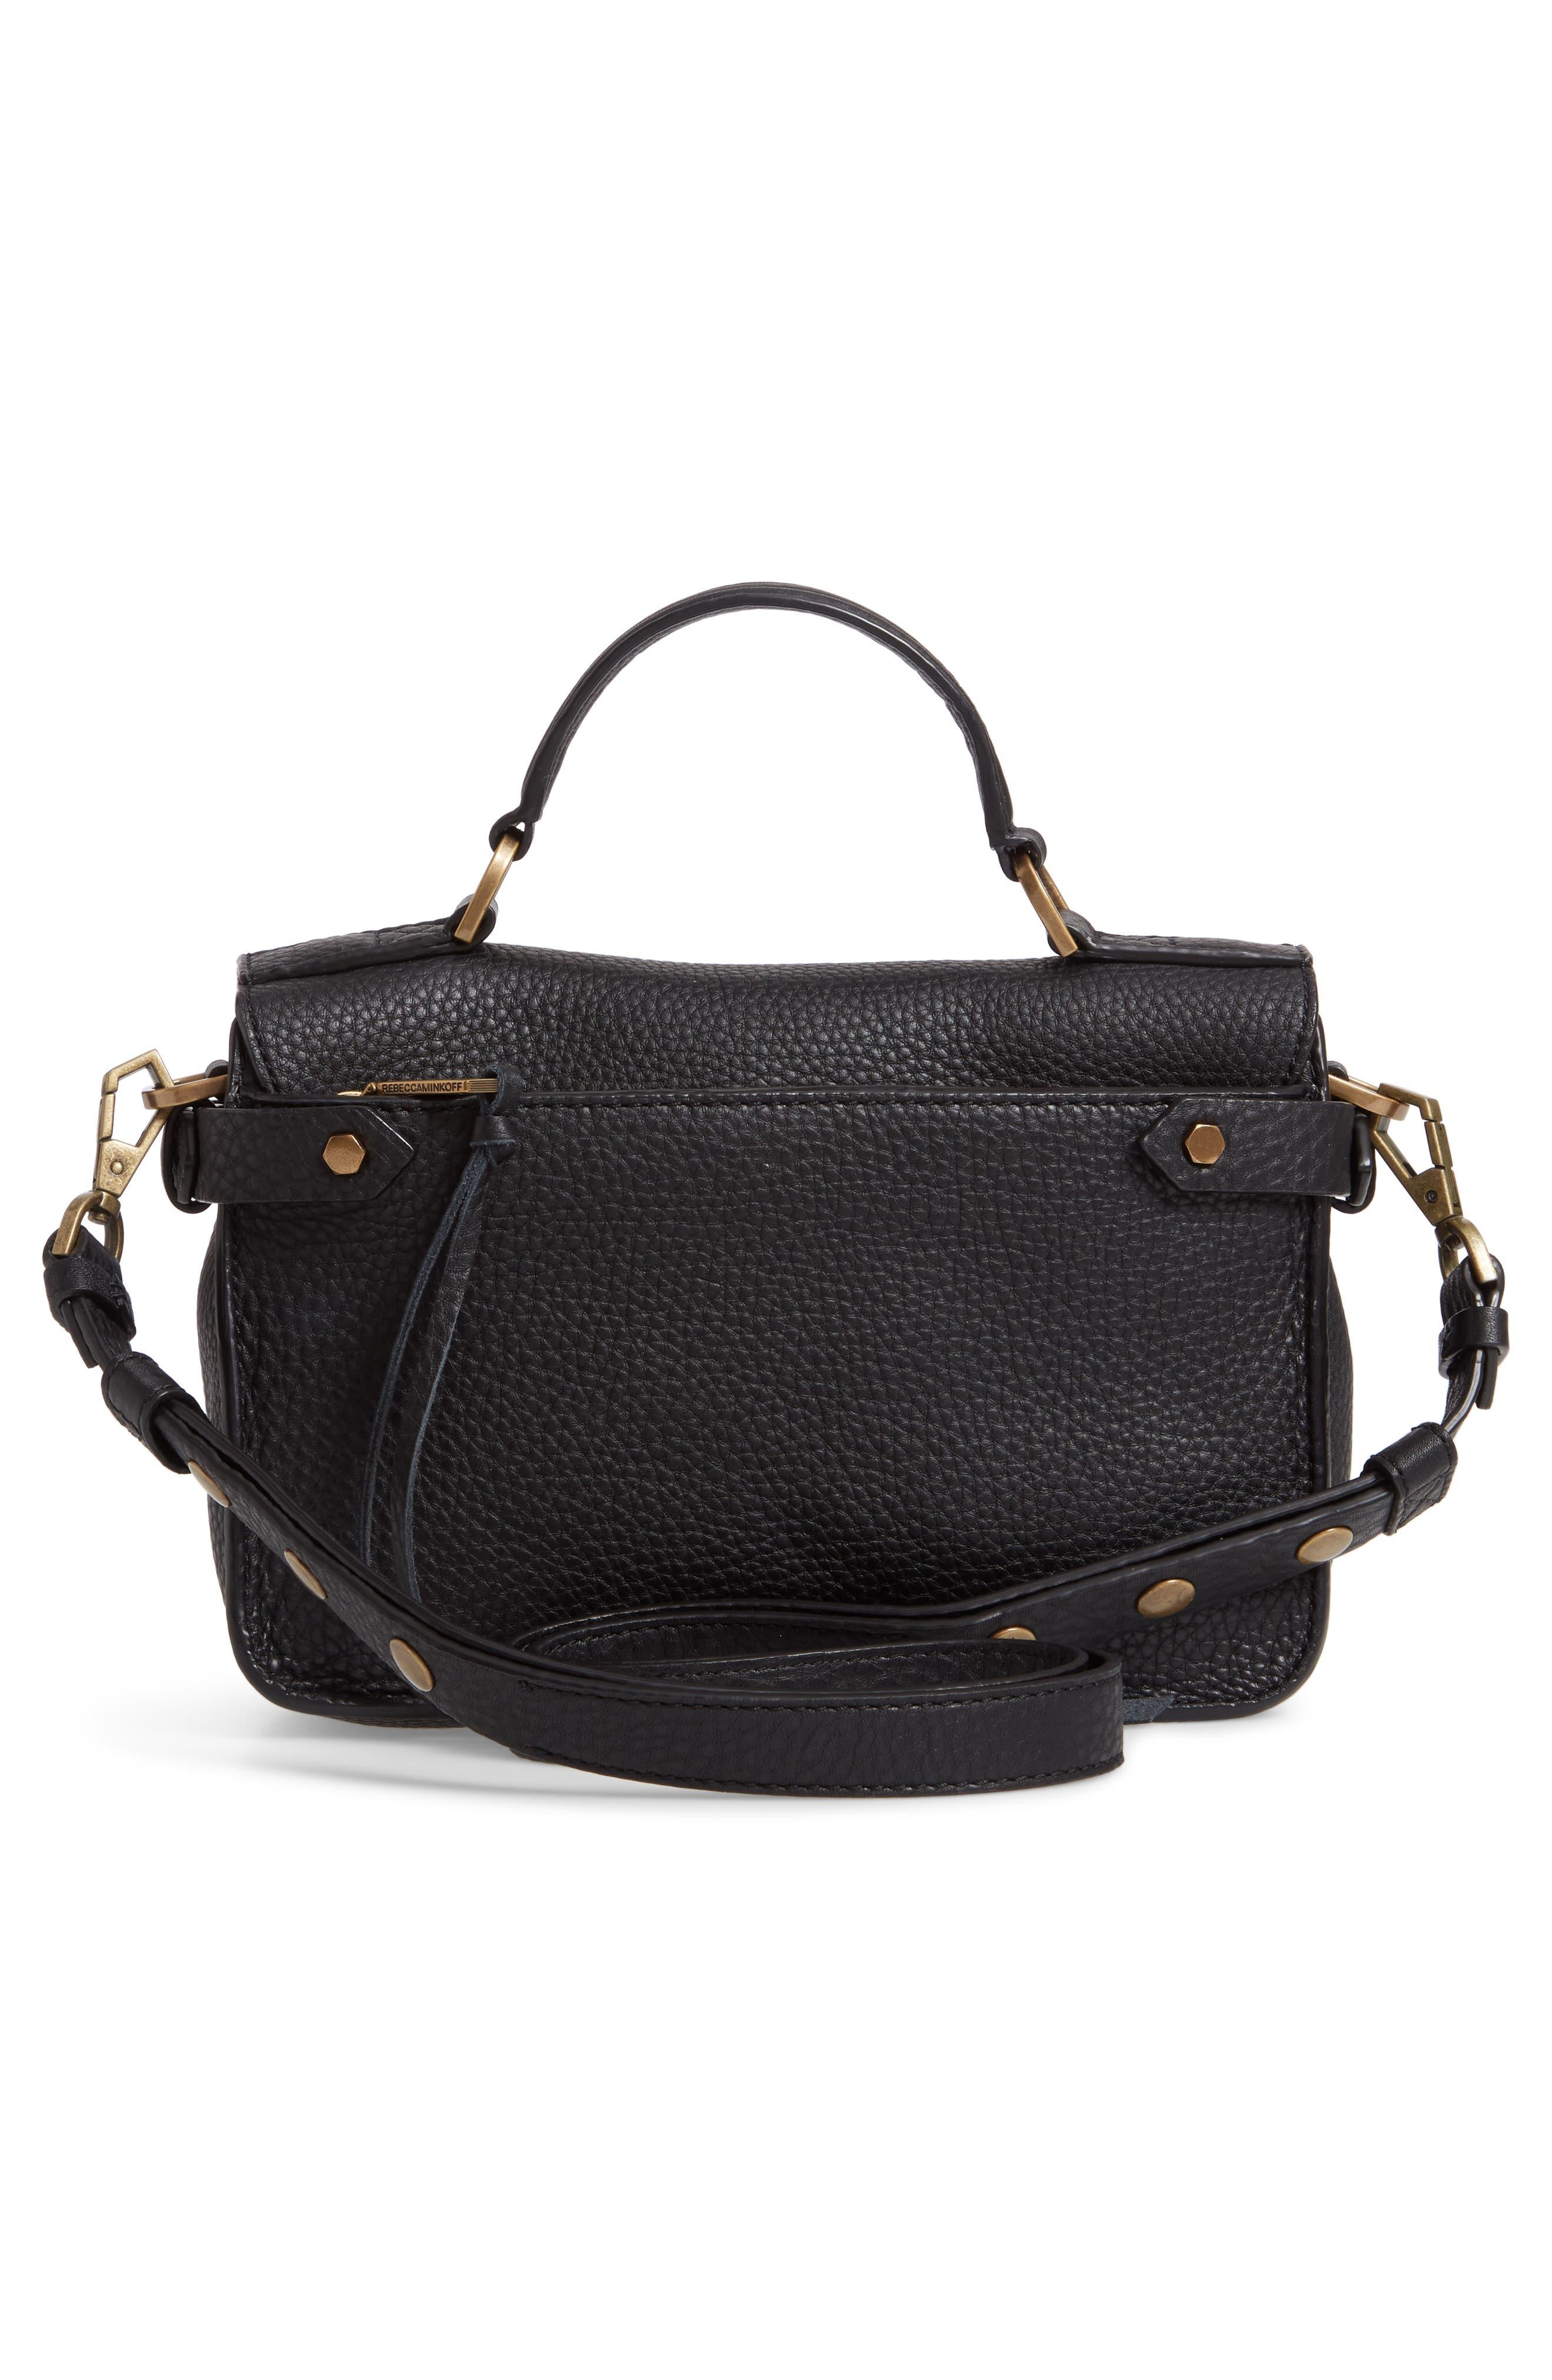 REBECCA MINKOFF, 'Small Darren' Leather Messenger Bag, Alternate thumbnail 3, color, BLACK